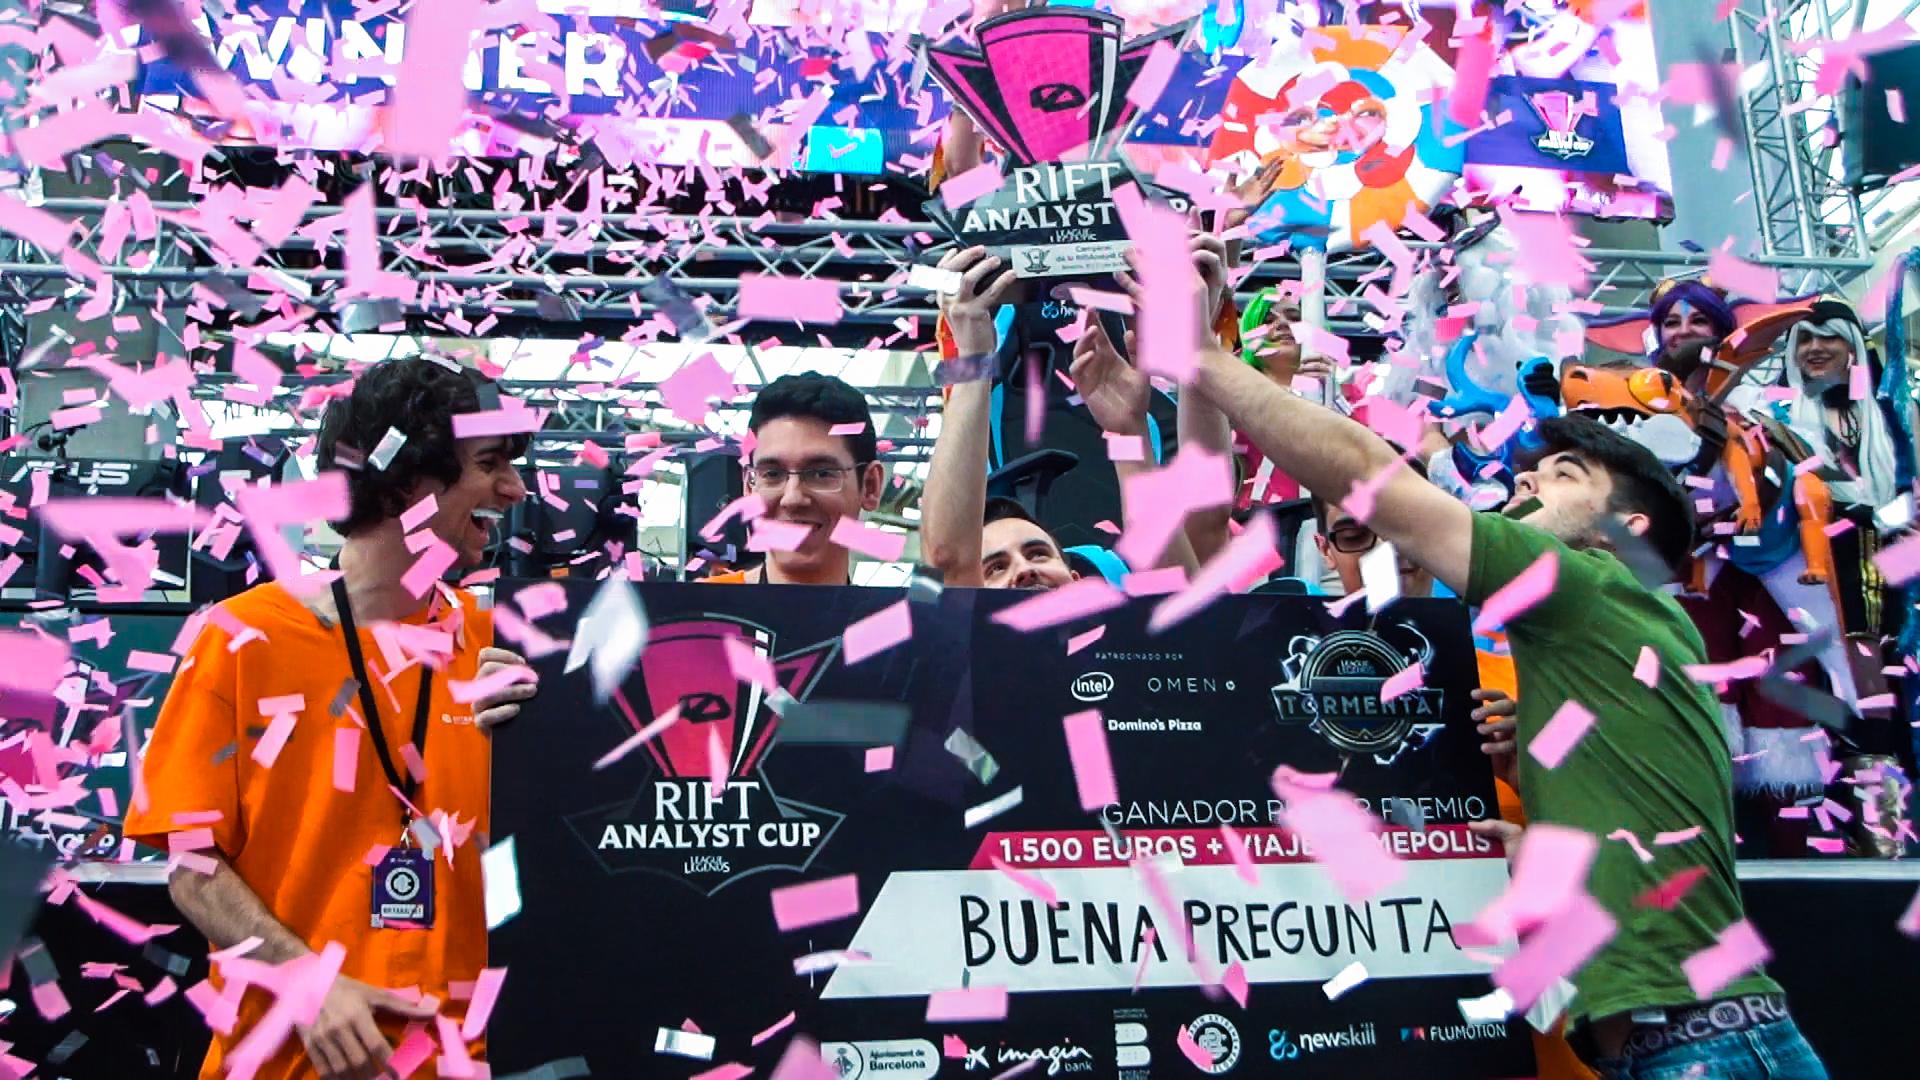 Buena Pregunta se alza con la copa de la RiftAnalyst Cup, primera parada del Circuito Tormenta de Riot